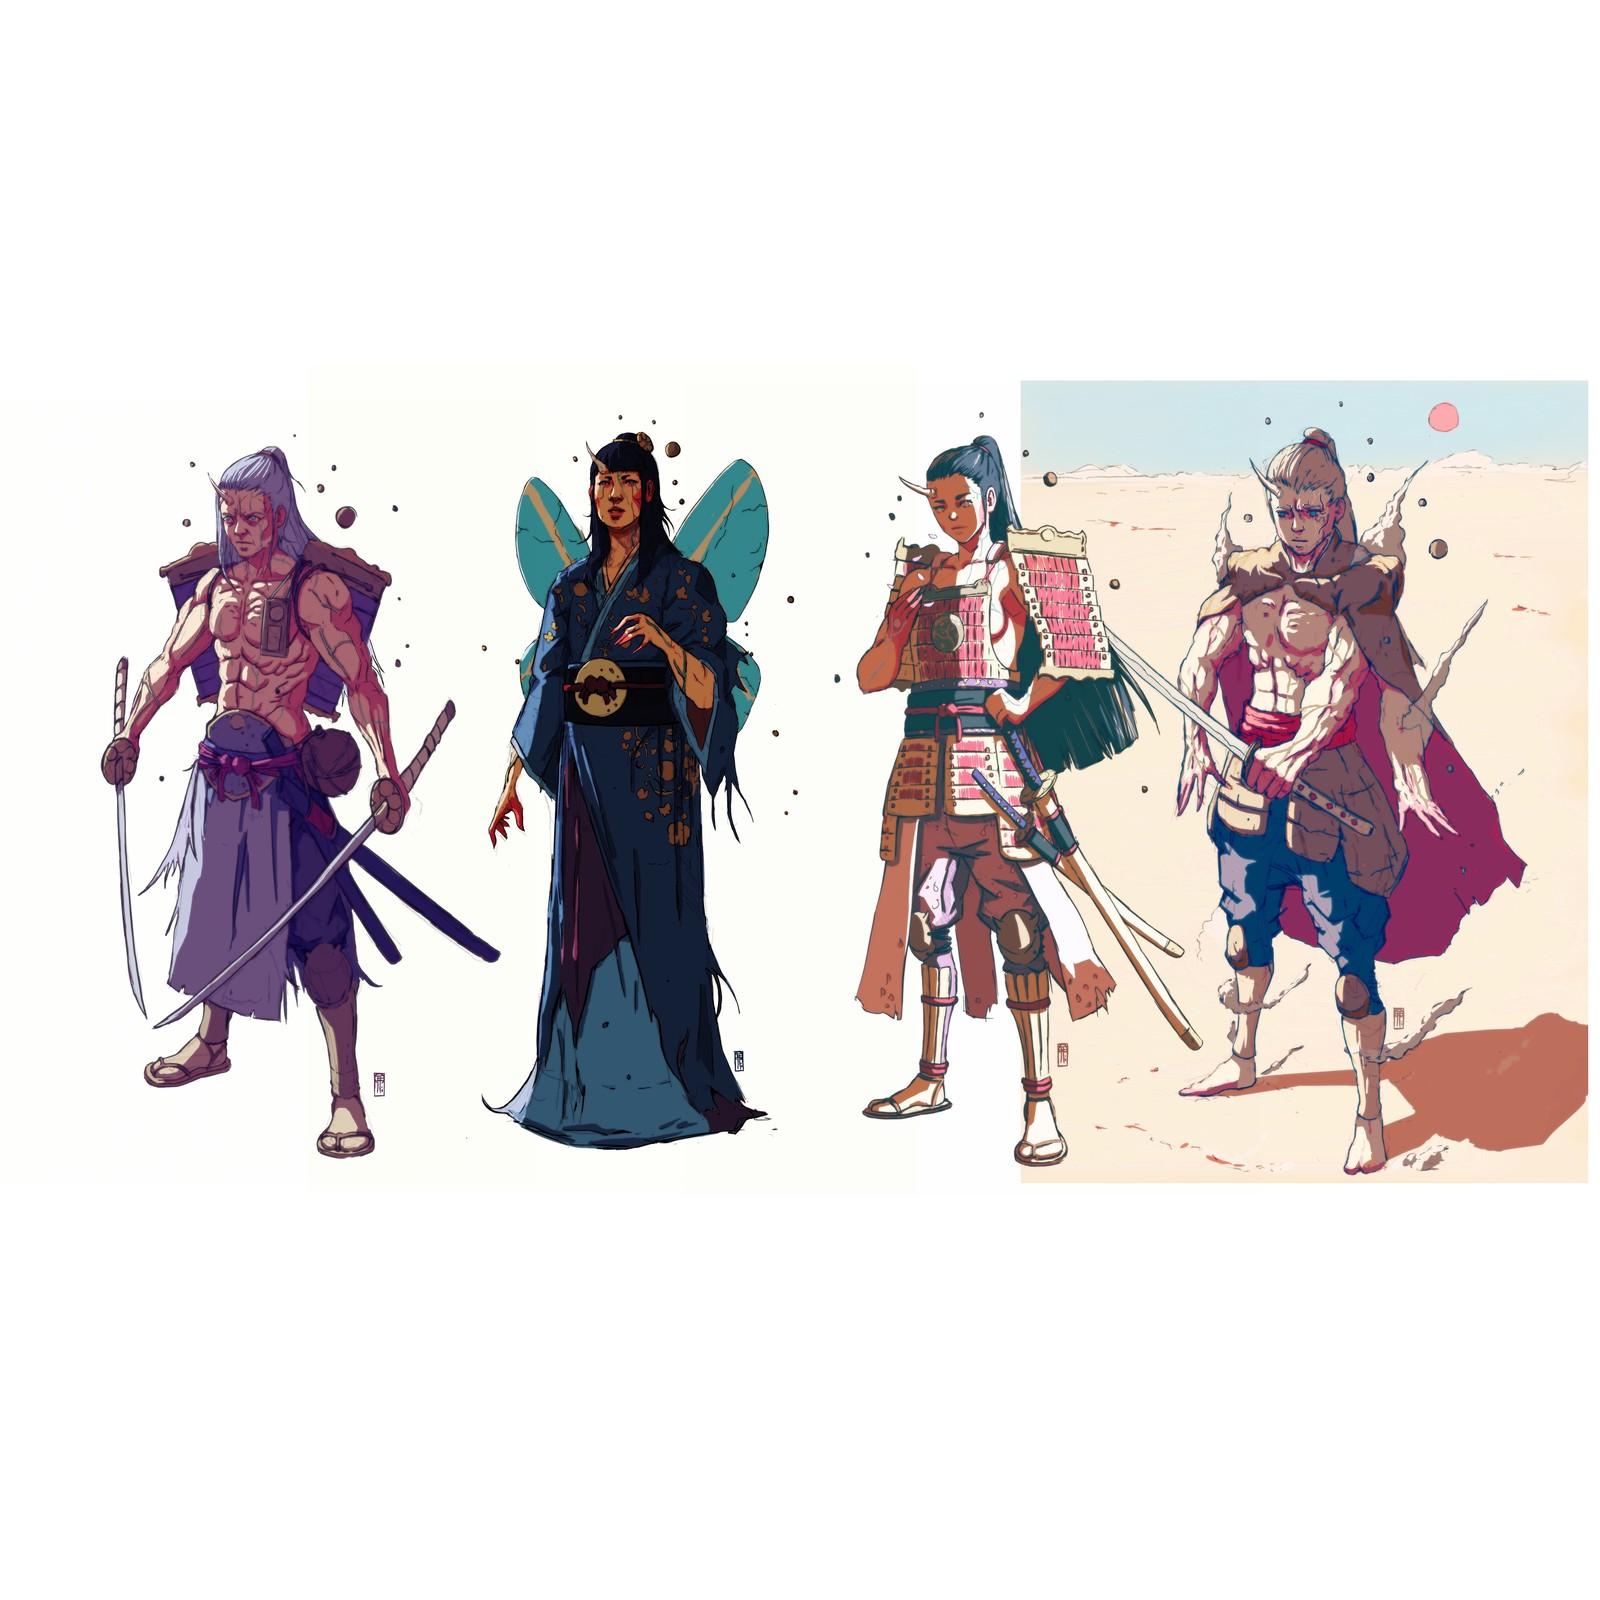 Kami's lineage